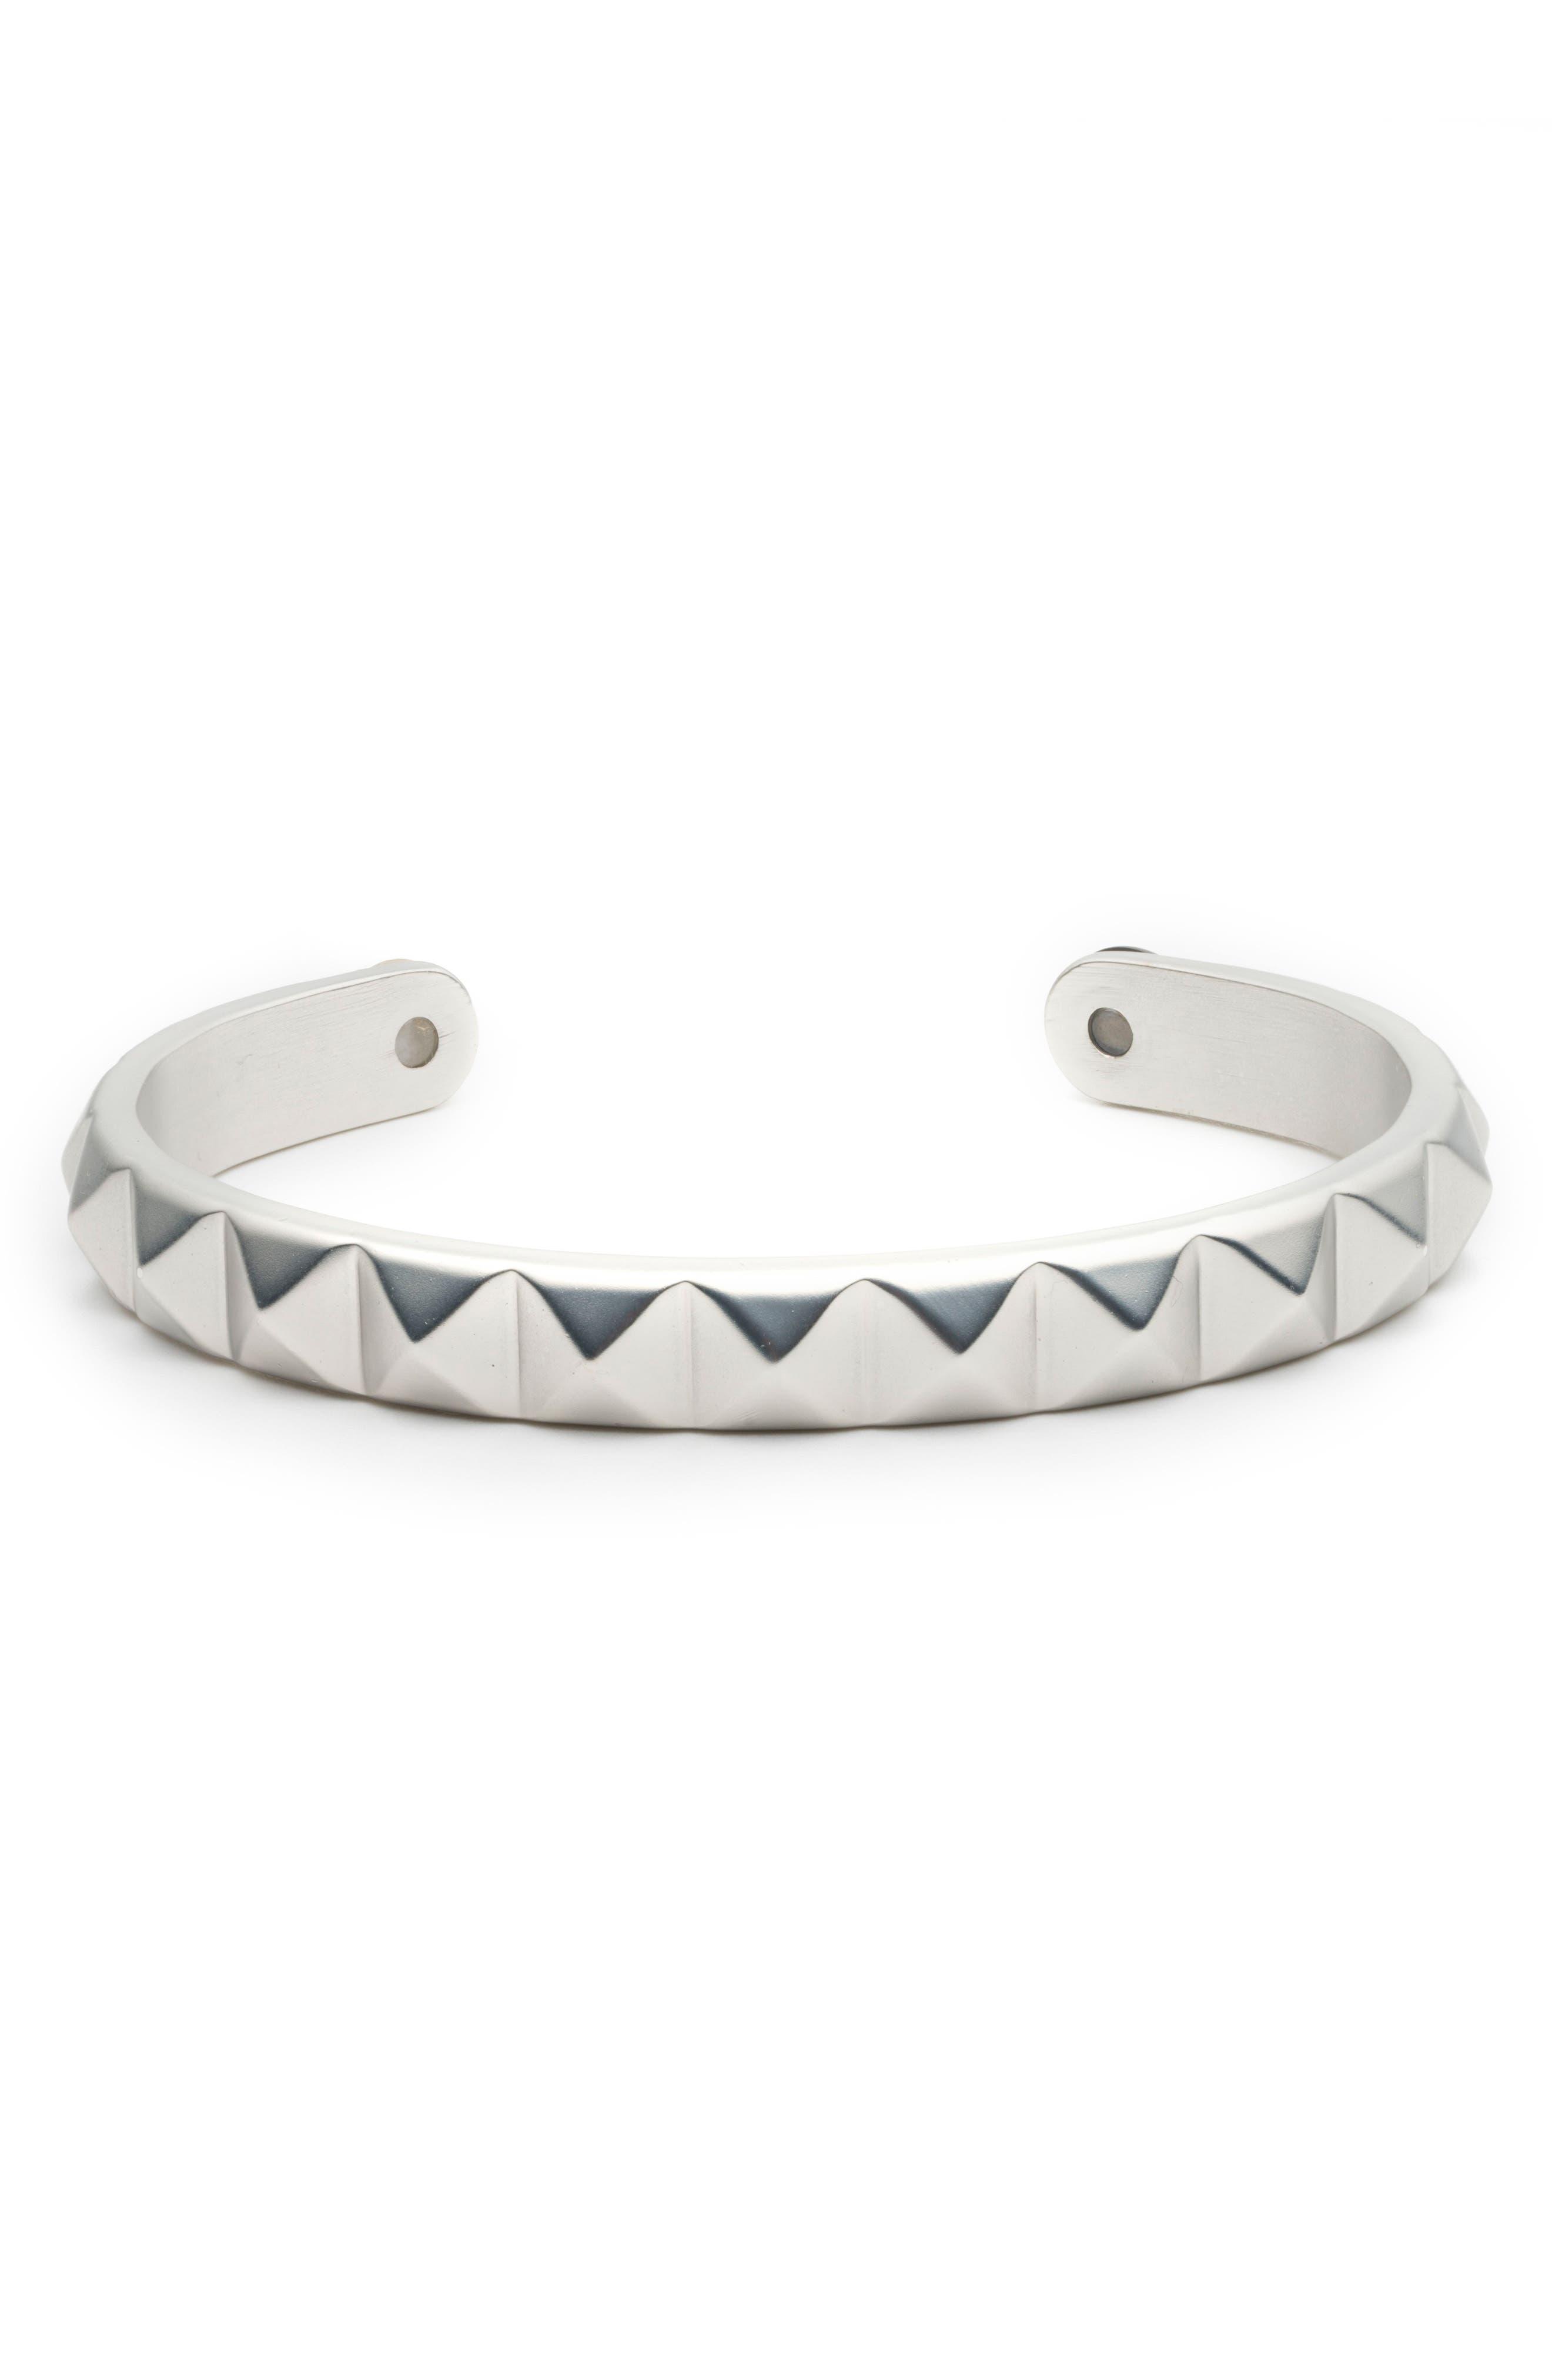 Lokai Cuff Bracelet